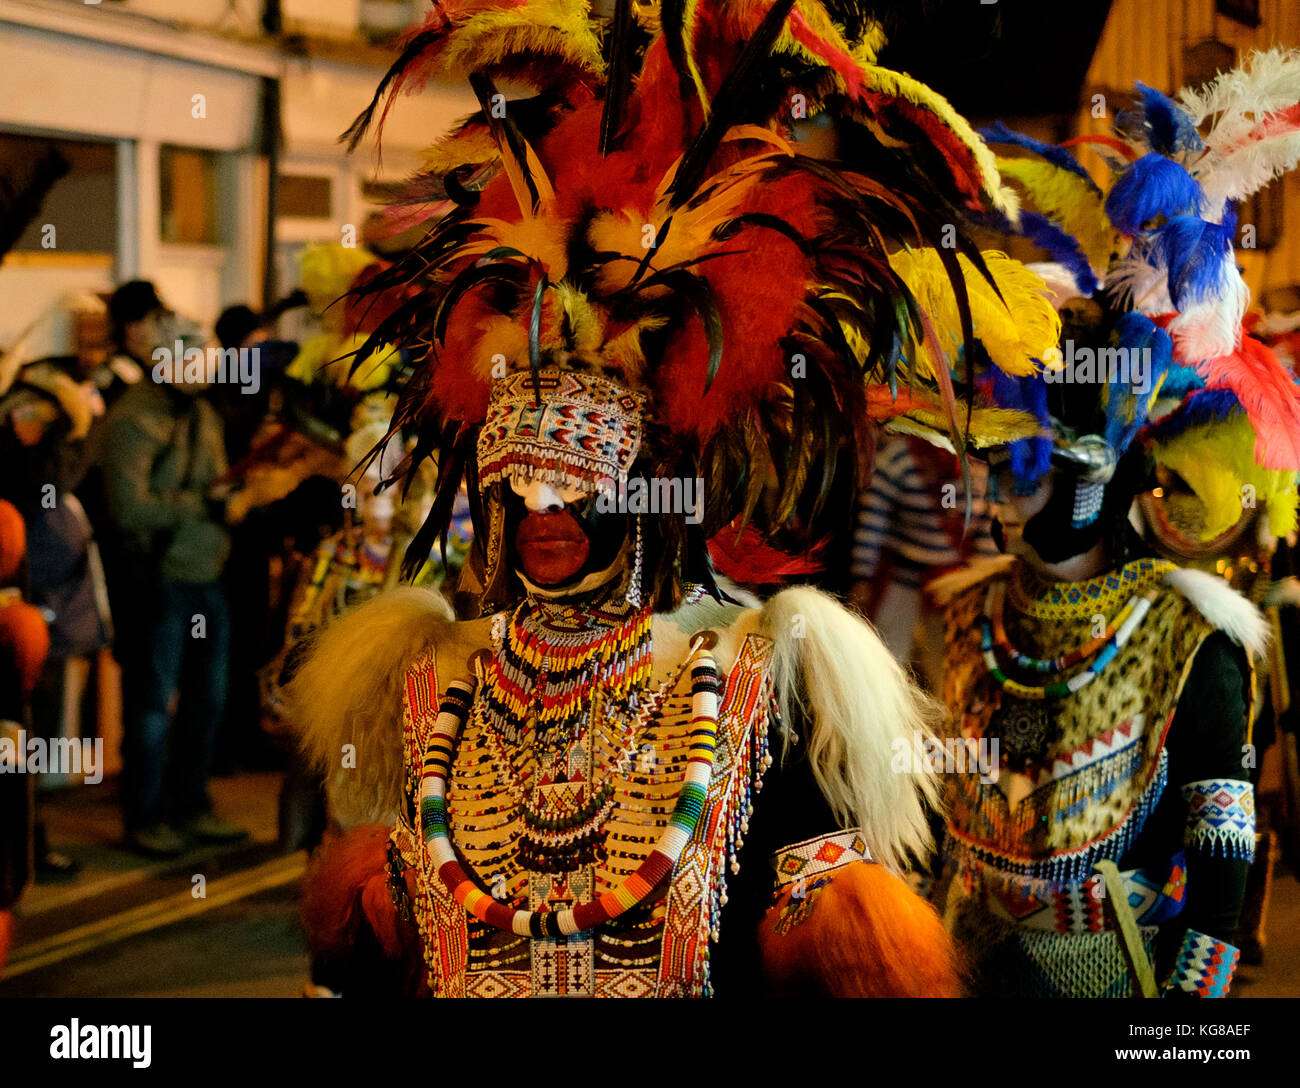 Lewes, UK - 4 November 2017: Participants from Borough Bonfire Society at Lewes Bonfire night, wearing Zulu costumes - Stock Image